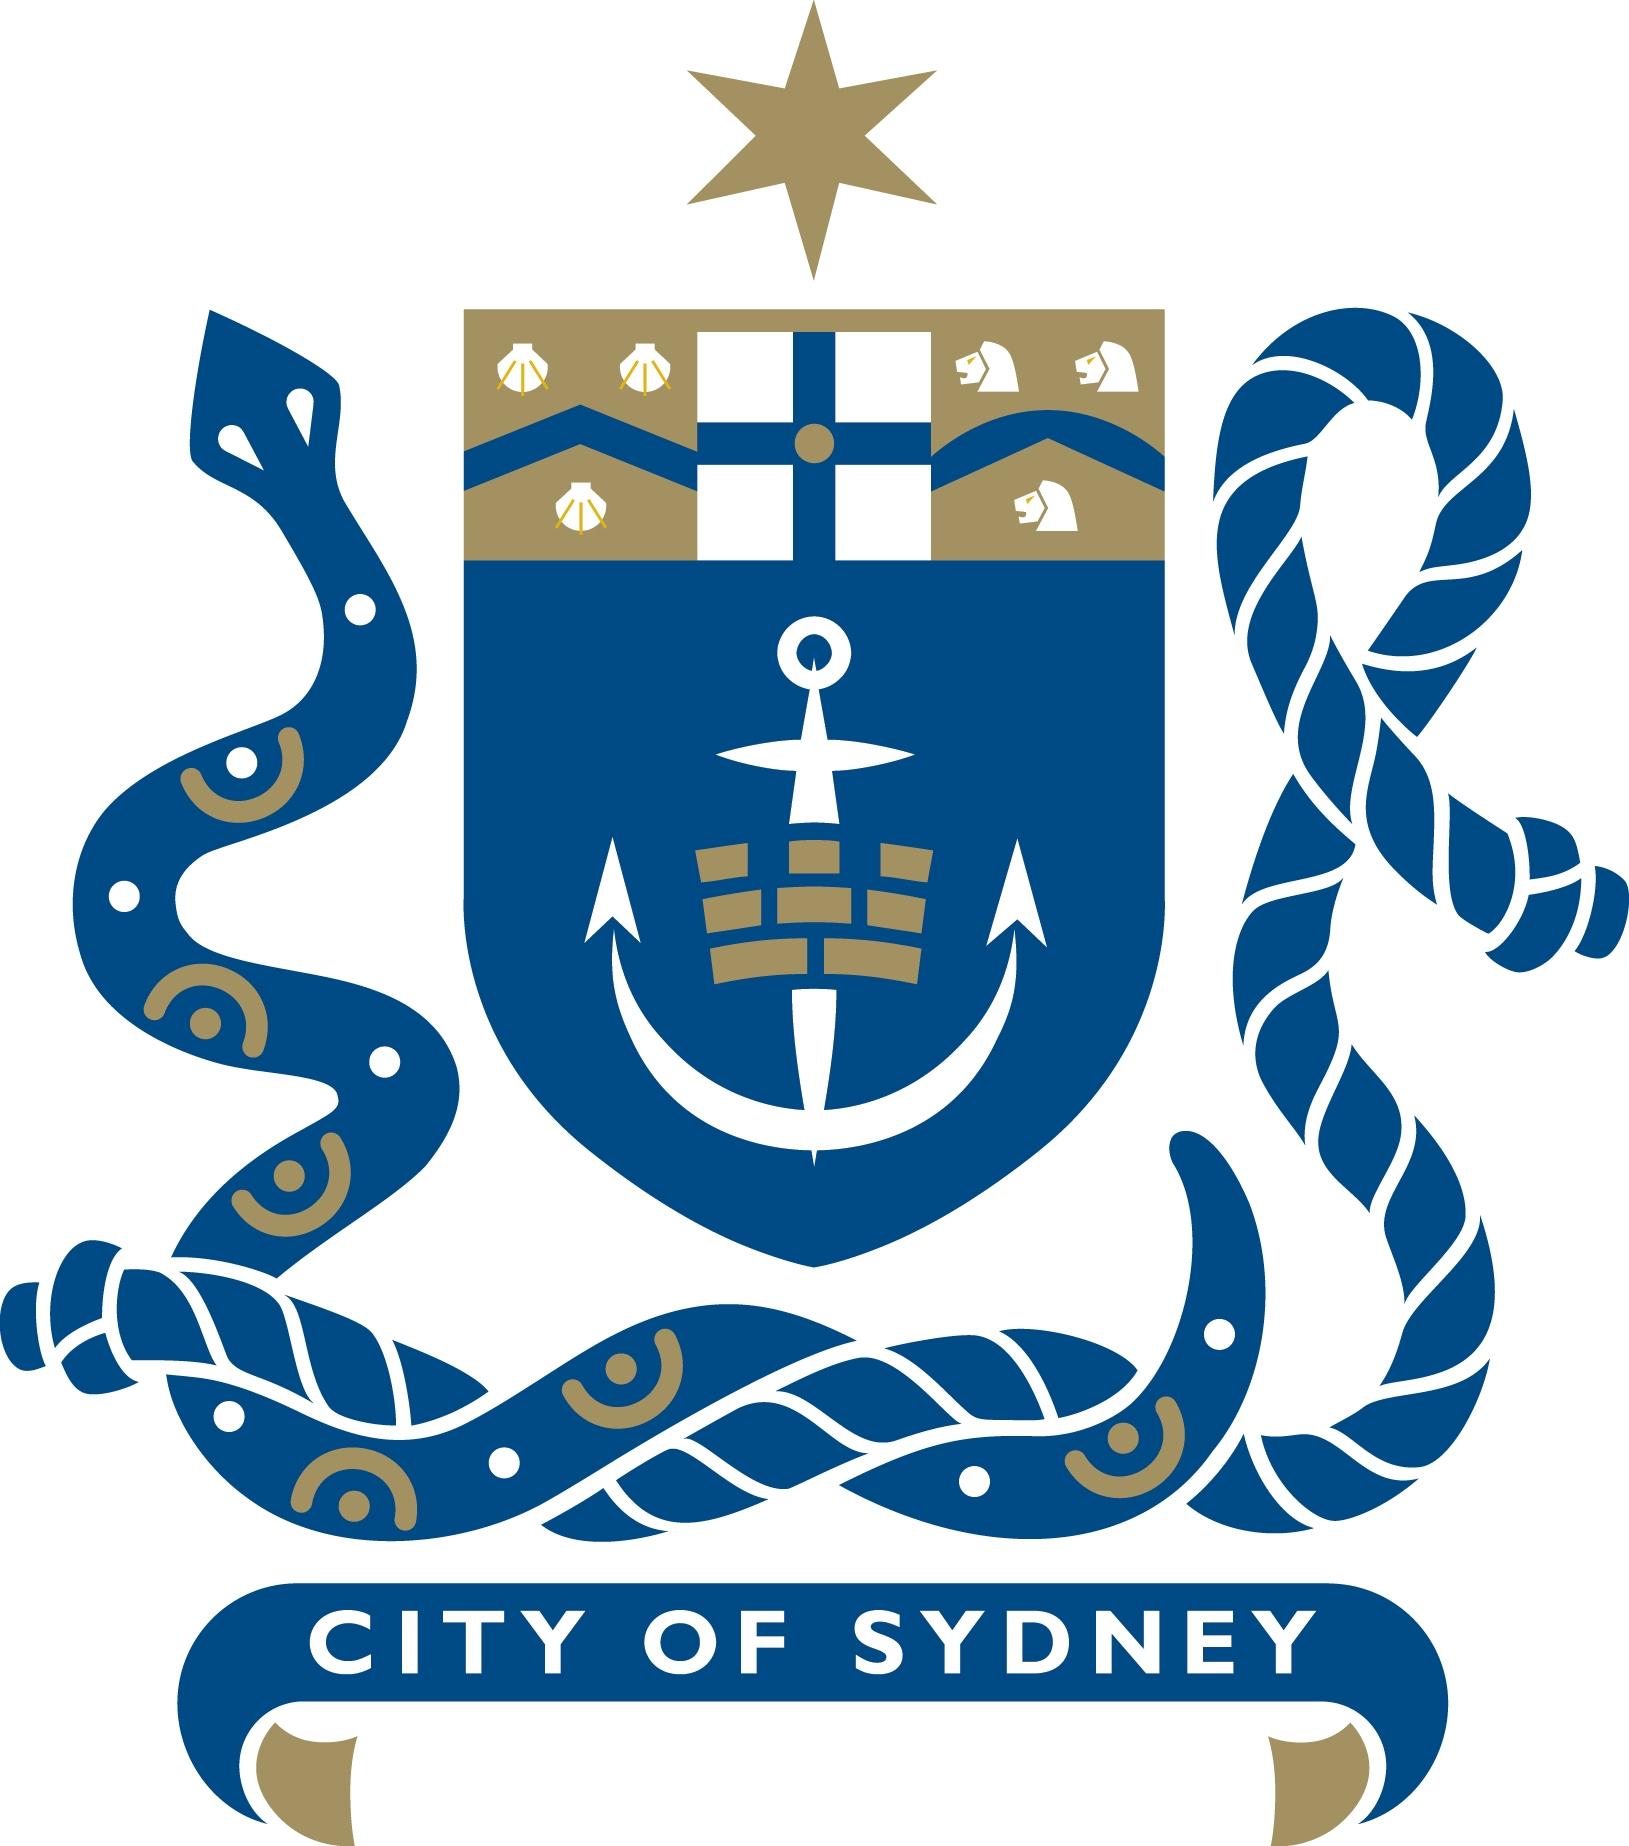 City of Sydney Coat of Arms.JPG